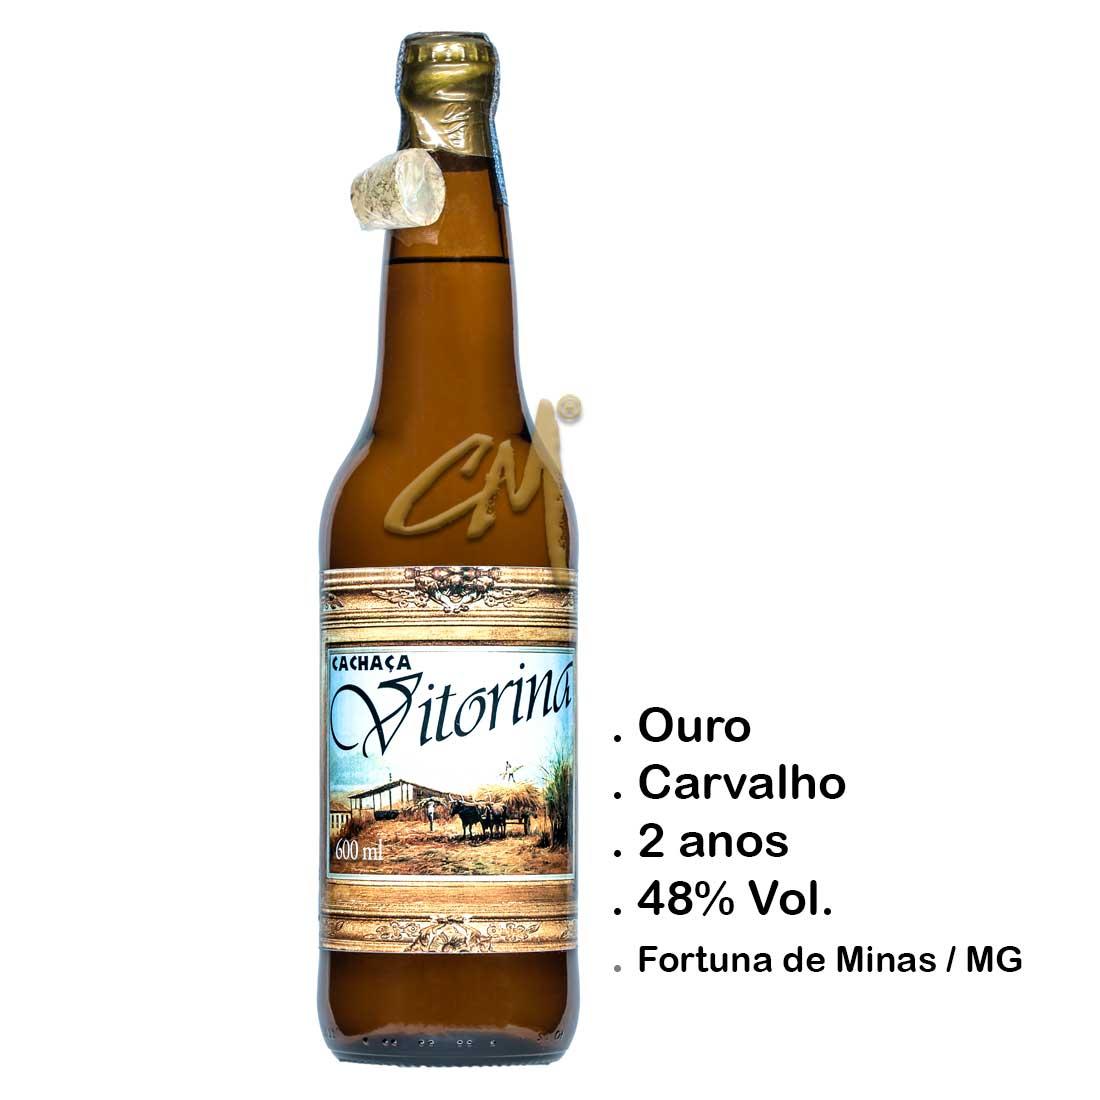 Cachaça Vitorina 600 ml   (Fortuna de Minas - MG)